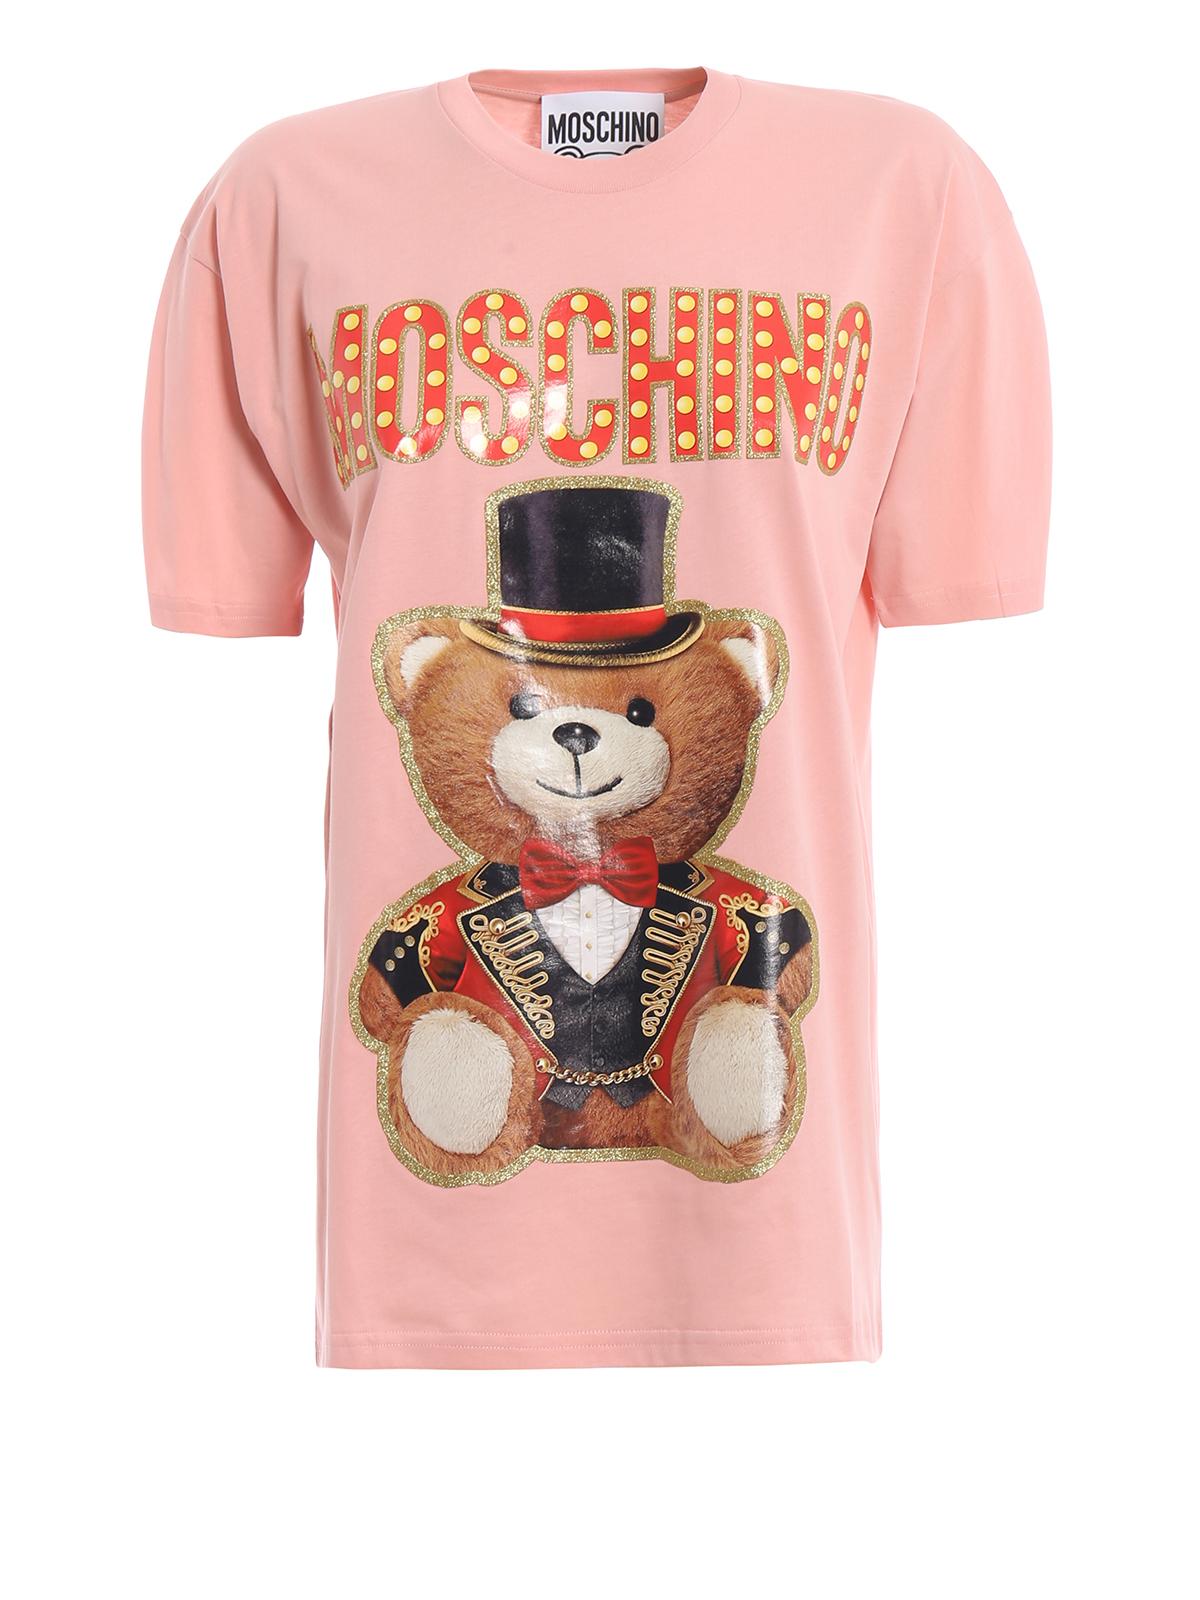 304830bb Moschino - Teddy Circus pink oversized T-shirt - t-shirts ...